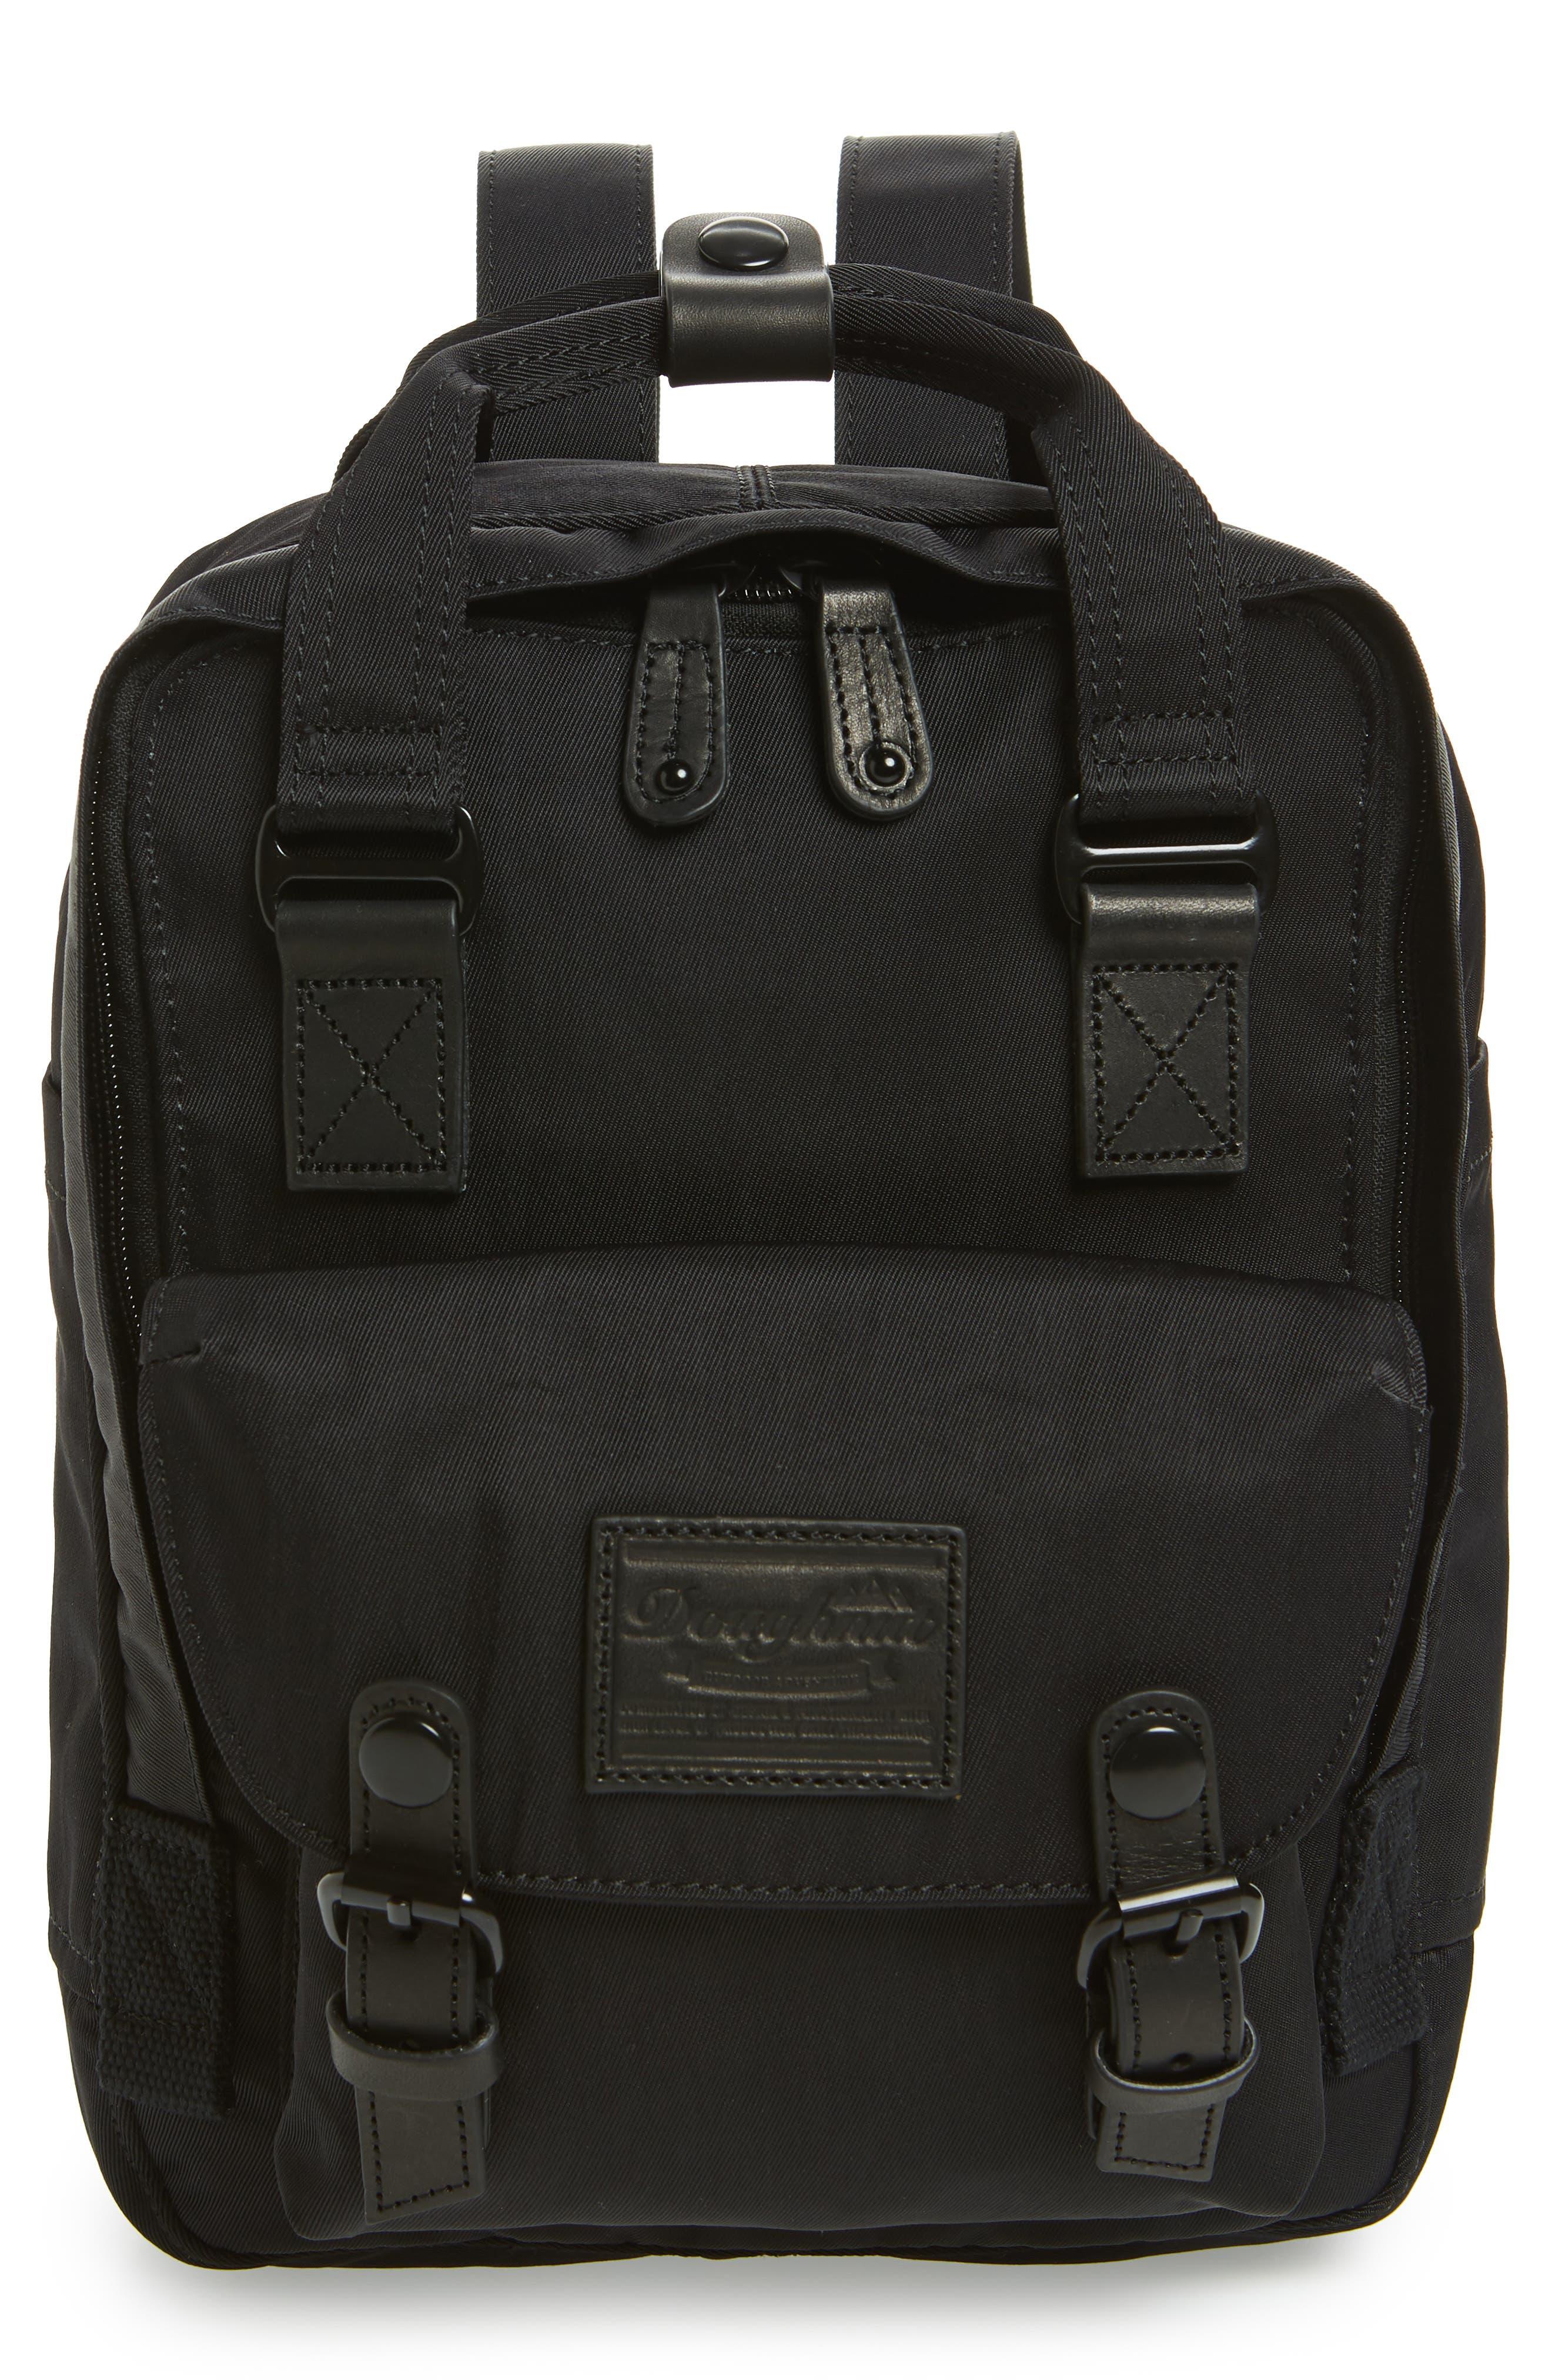 Mini Macaroon Black Series Water Resistant Backpack,                             Main thumbnail 1, color,                             Black